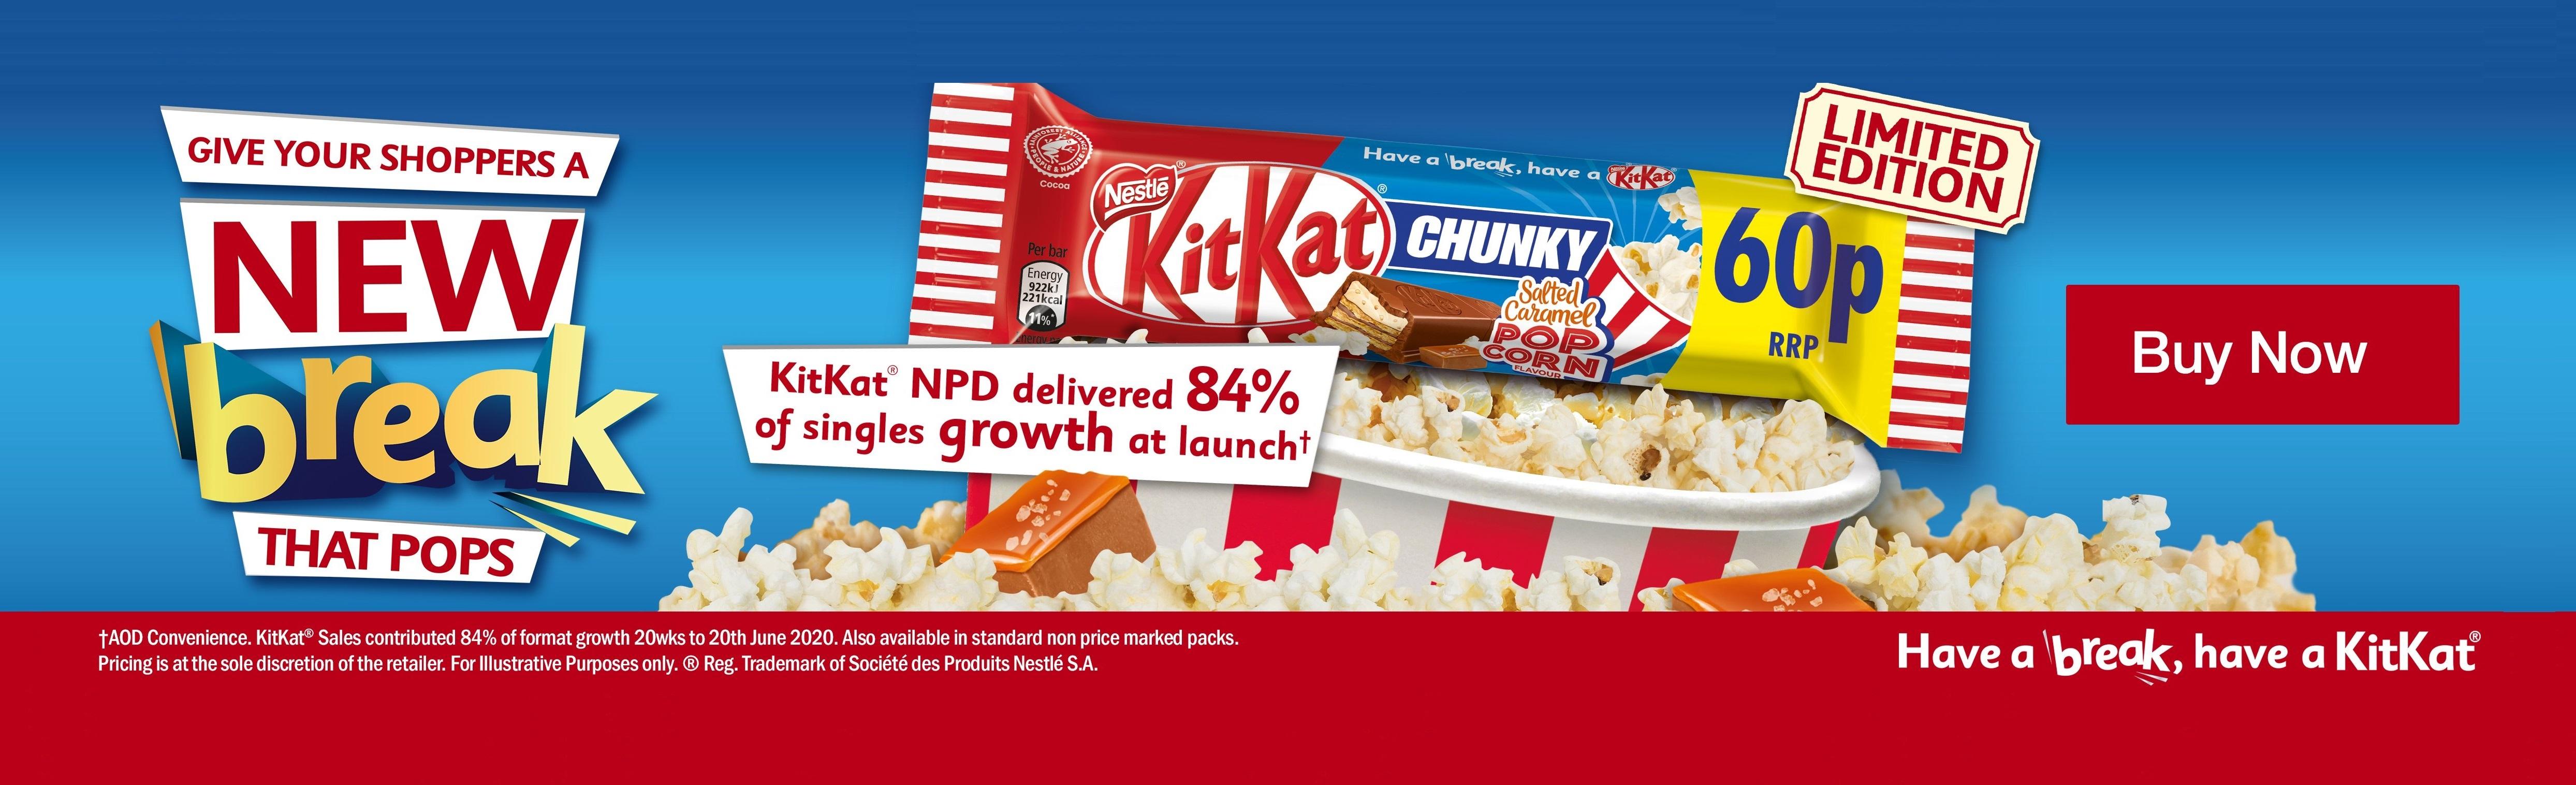 KitKat Chunky Popcorn